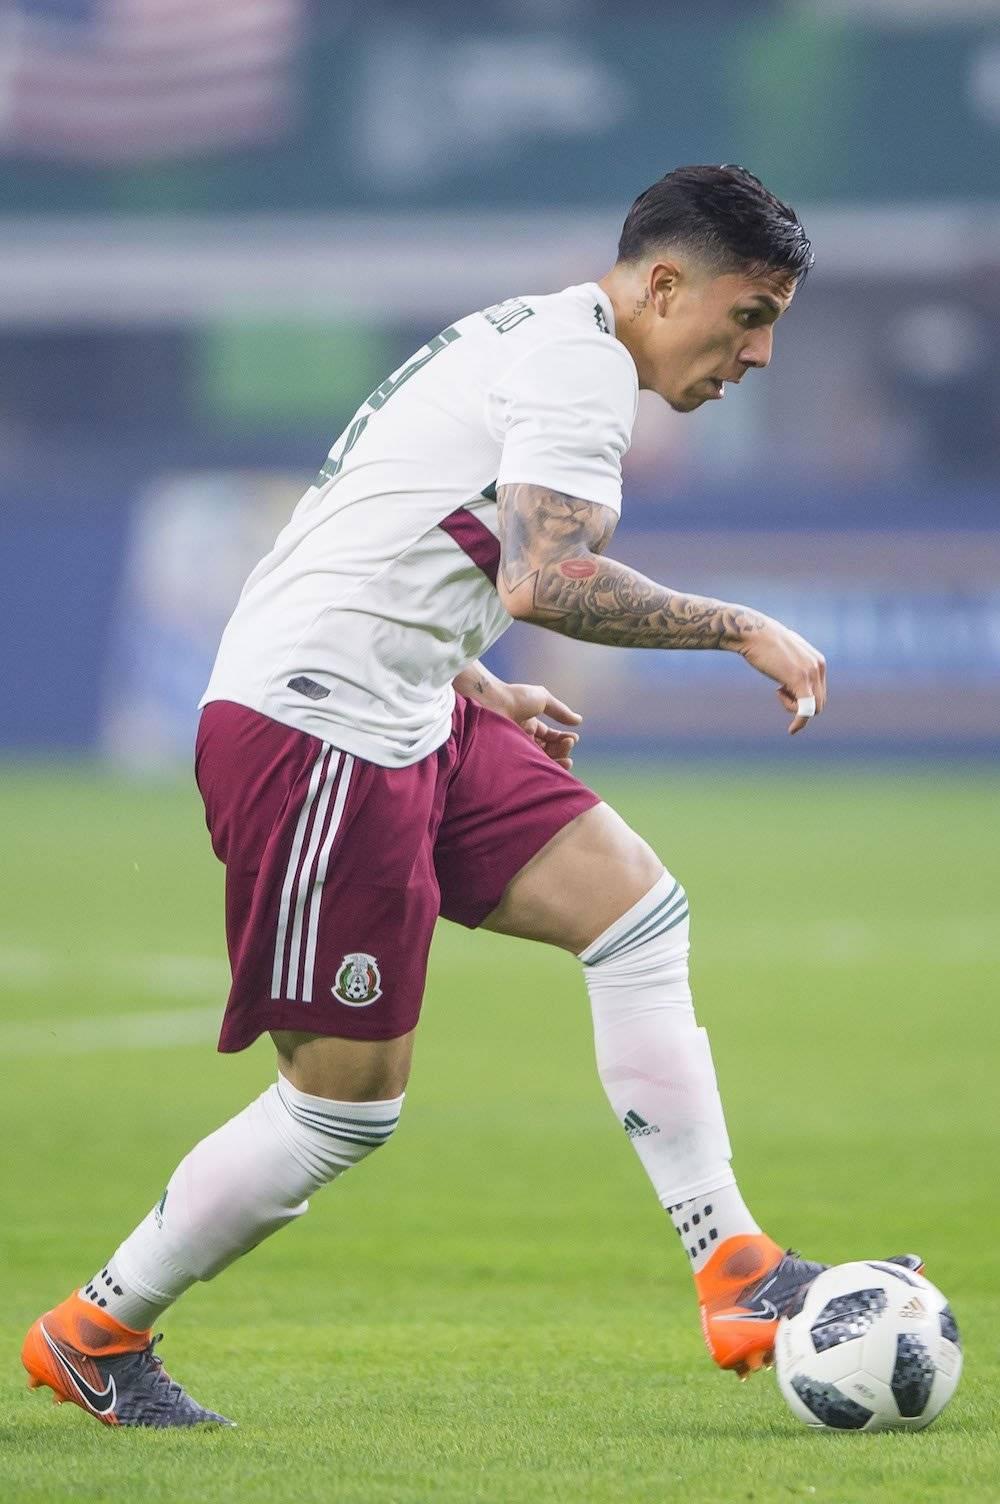 Carlos Salcedo / Mexsport